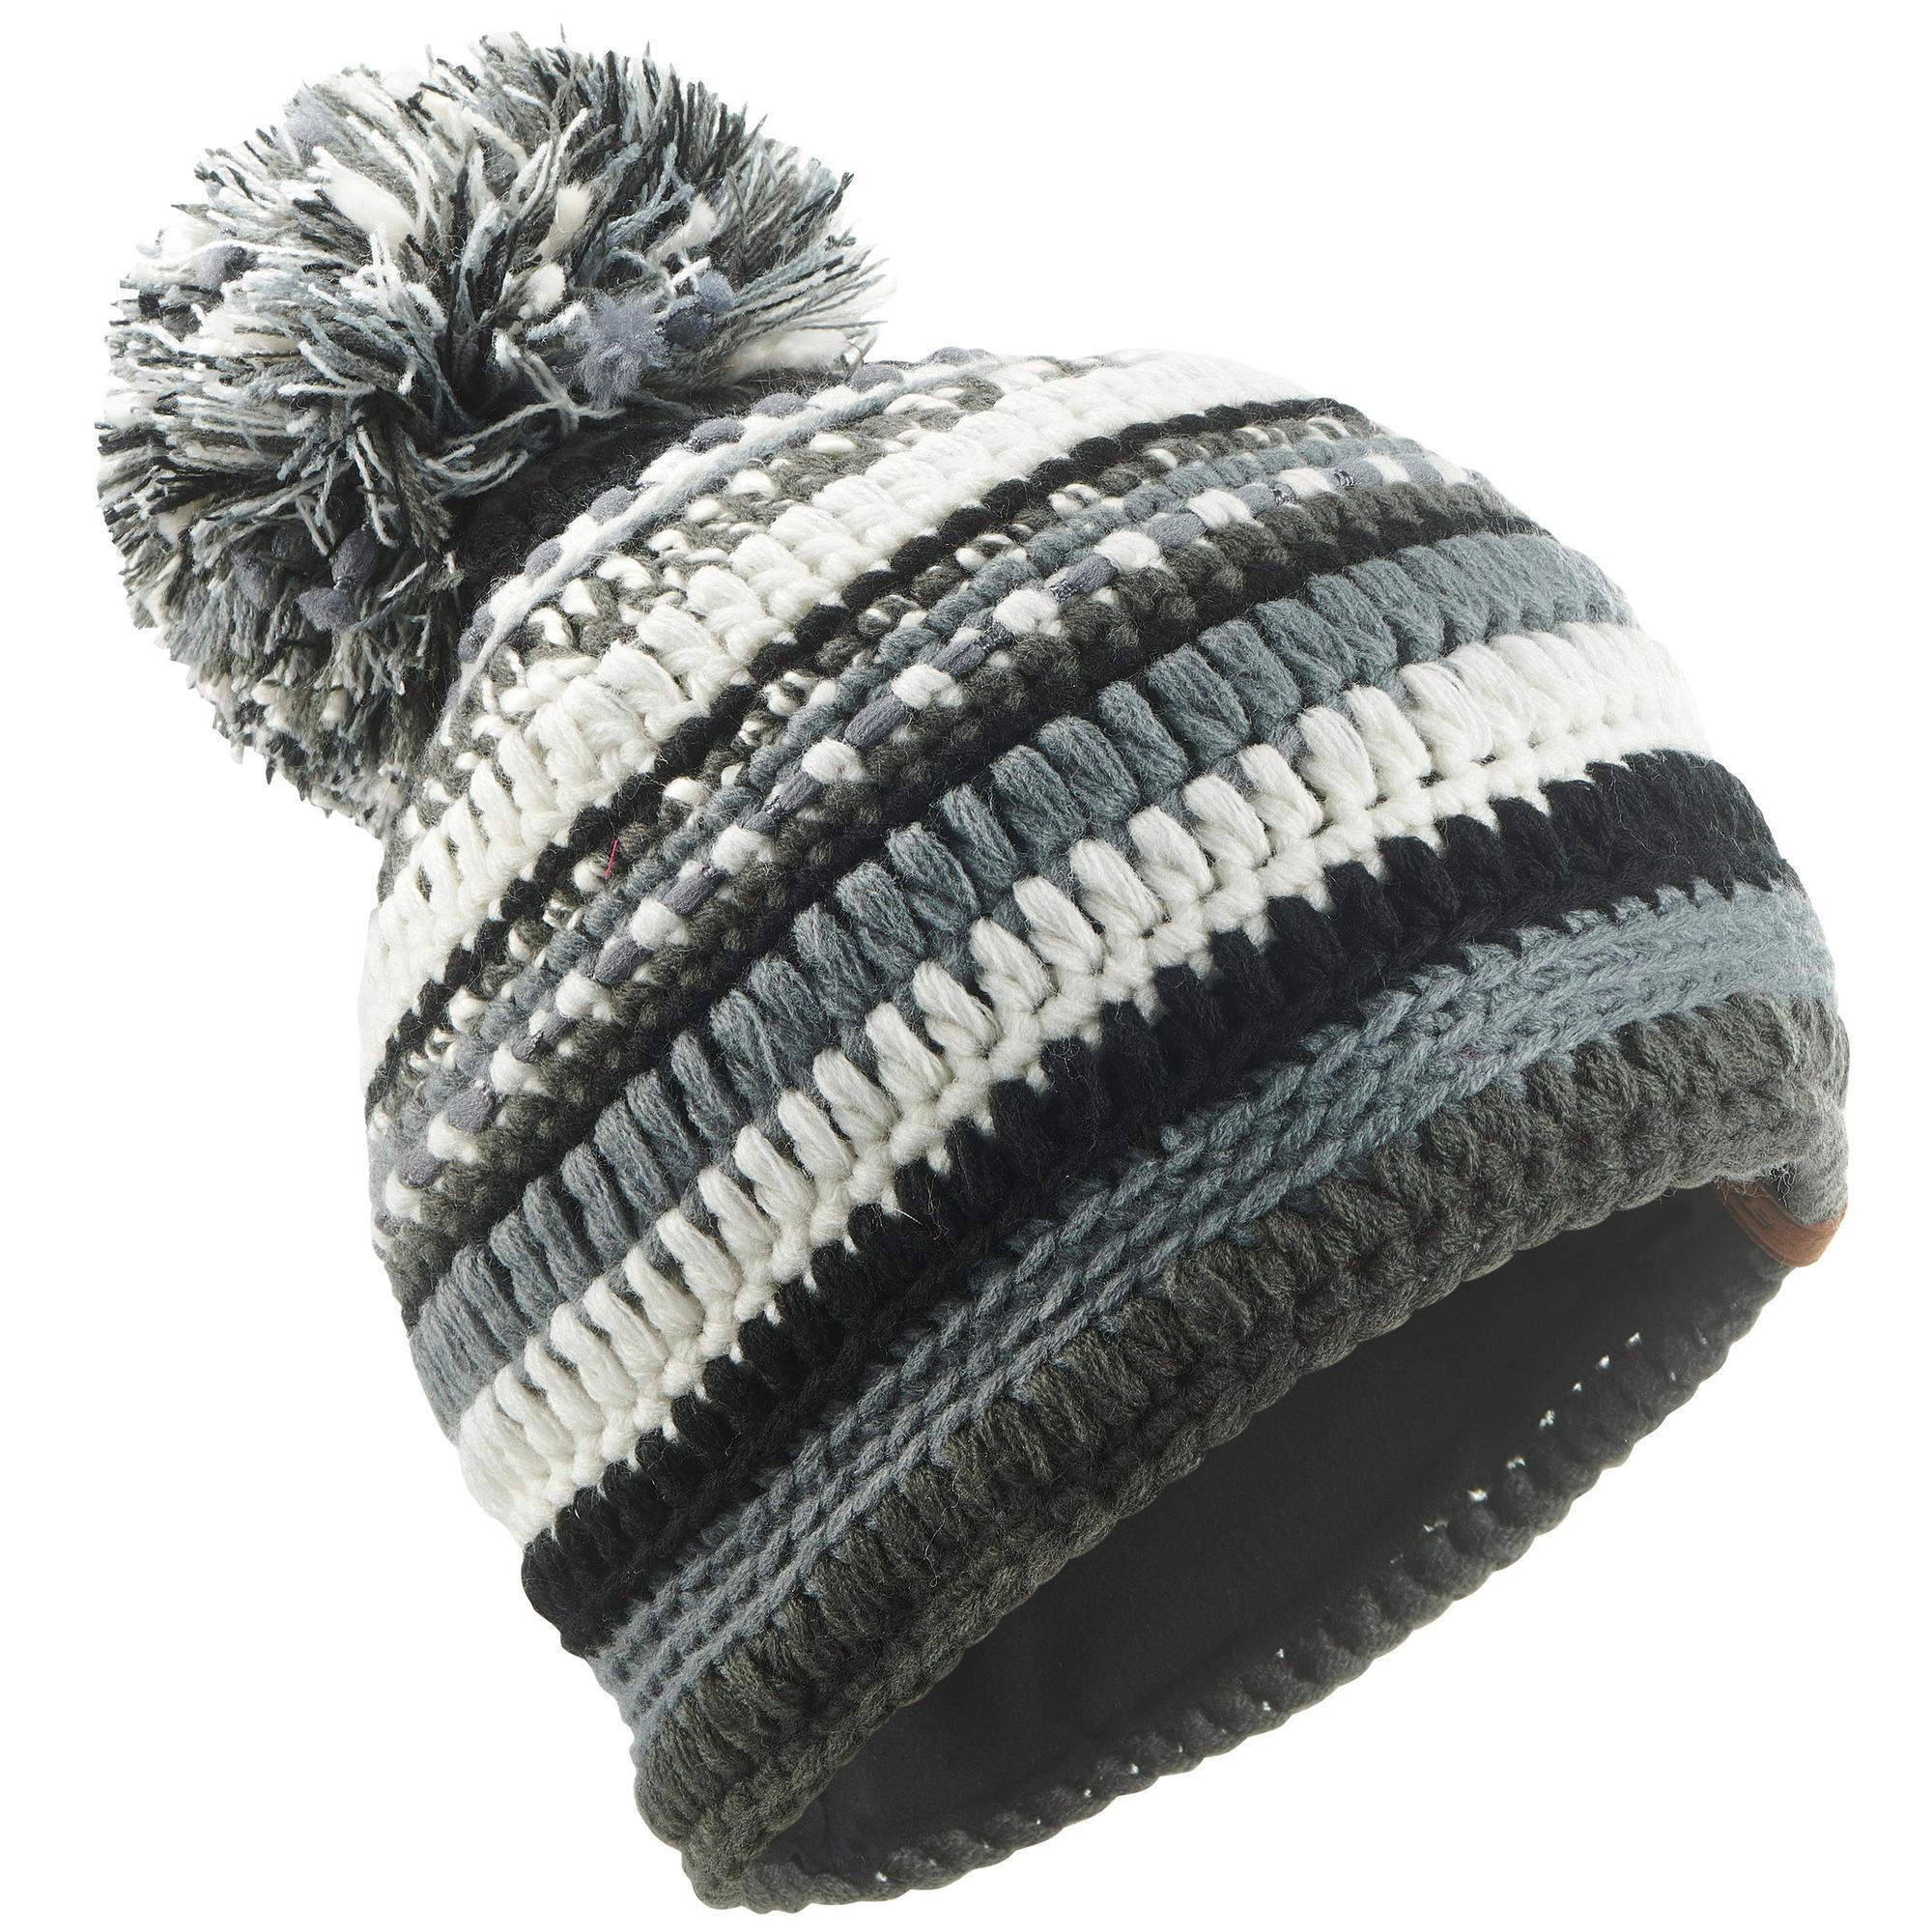 Skimütze Mixyarn Erwachsene schwarz/grau/weiß | Accessoires > Mützen > Skimützen | Grau - Weiß | Wed´ze